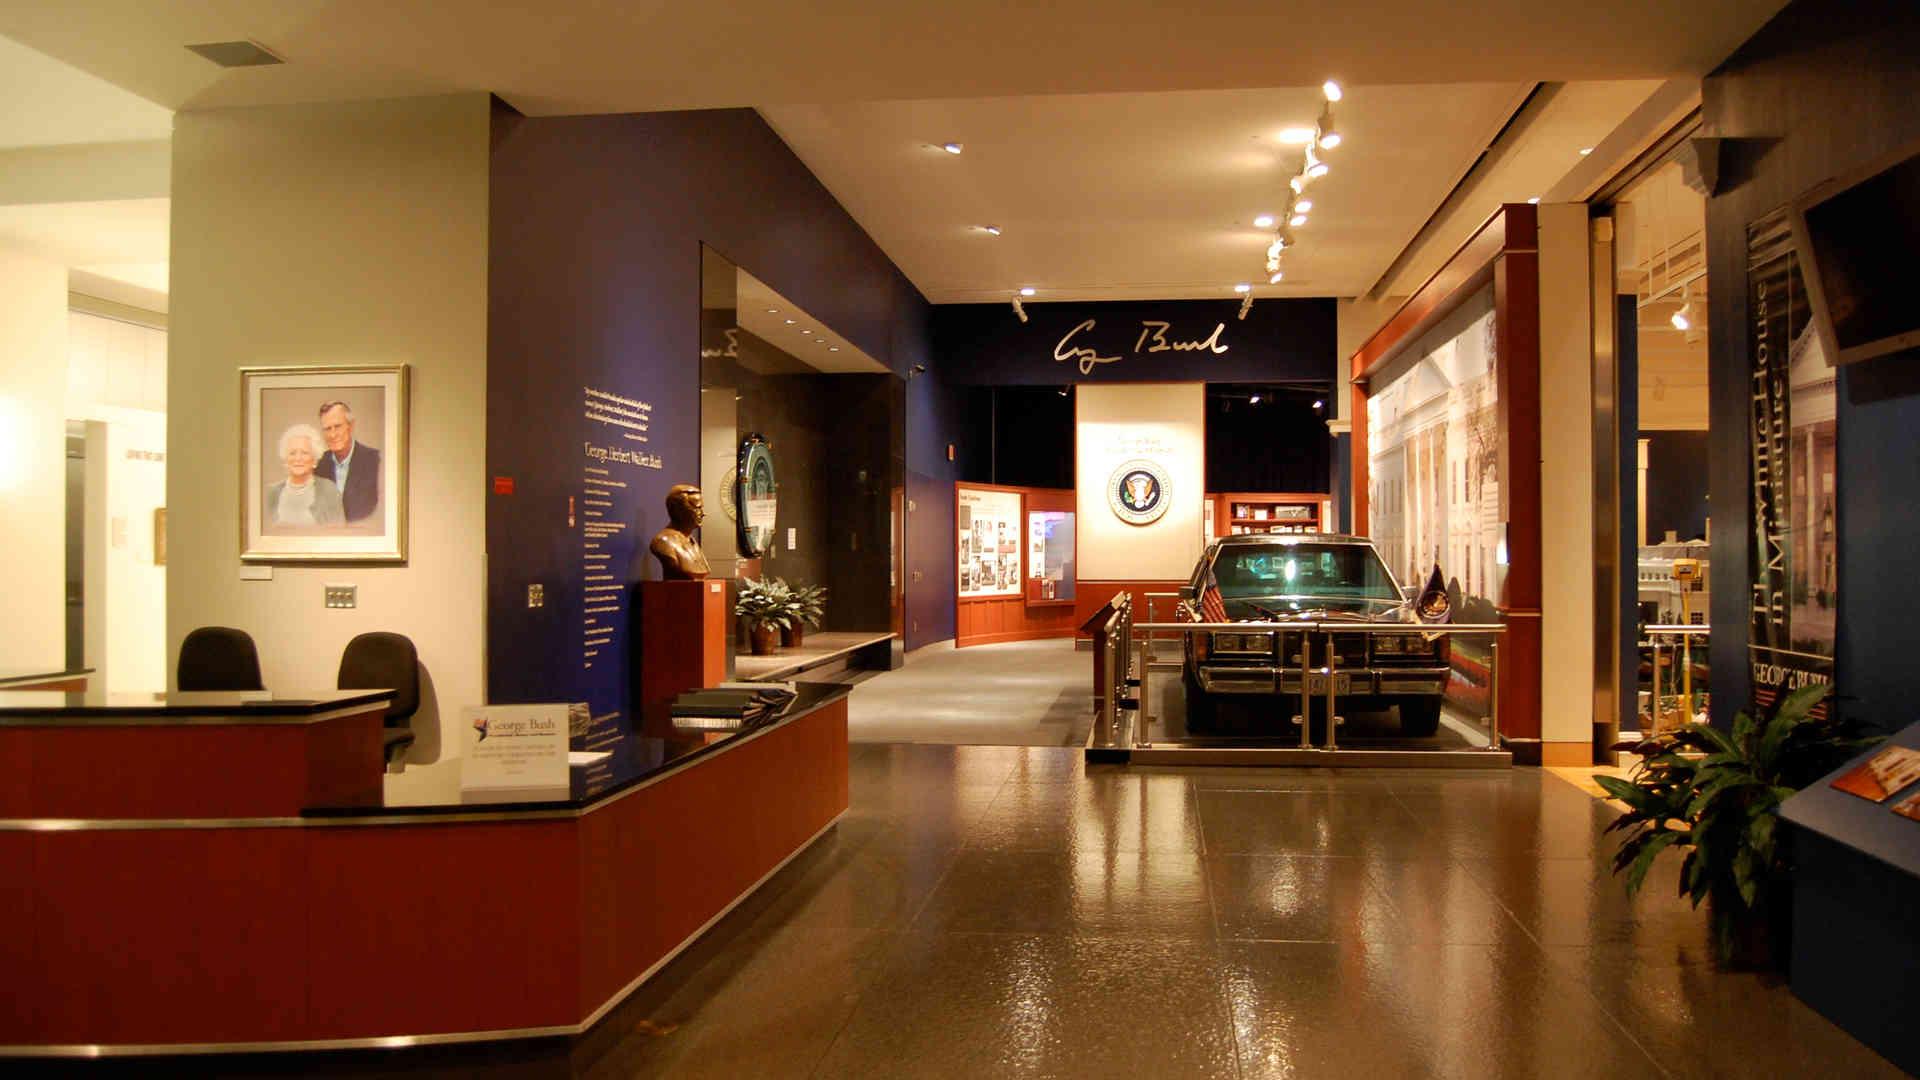 george bush library and museum secret service car exhibit